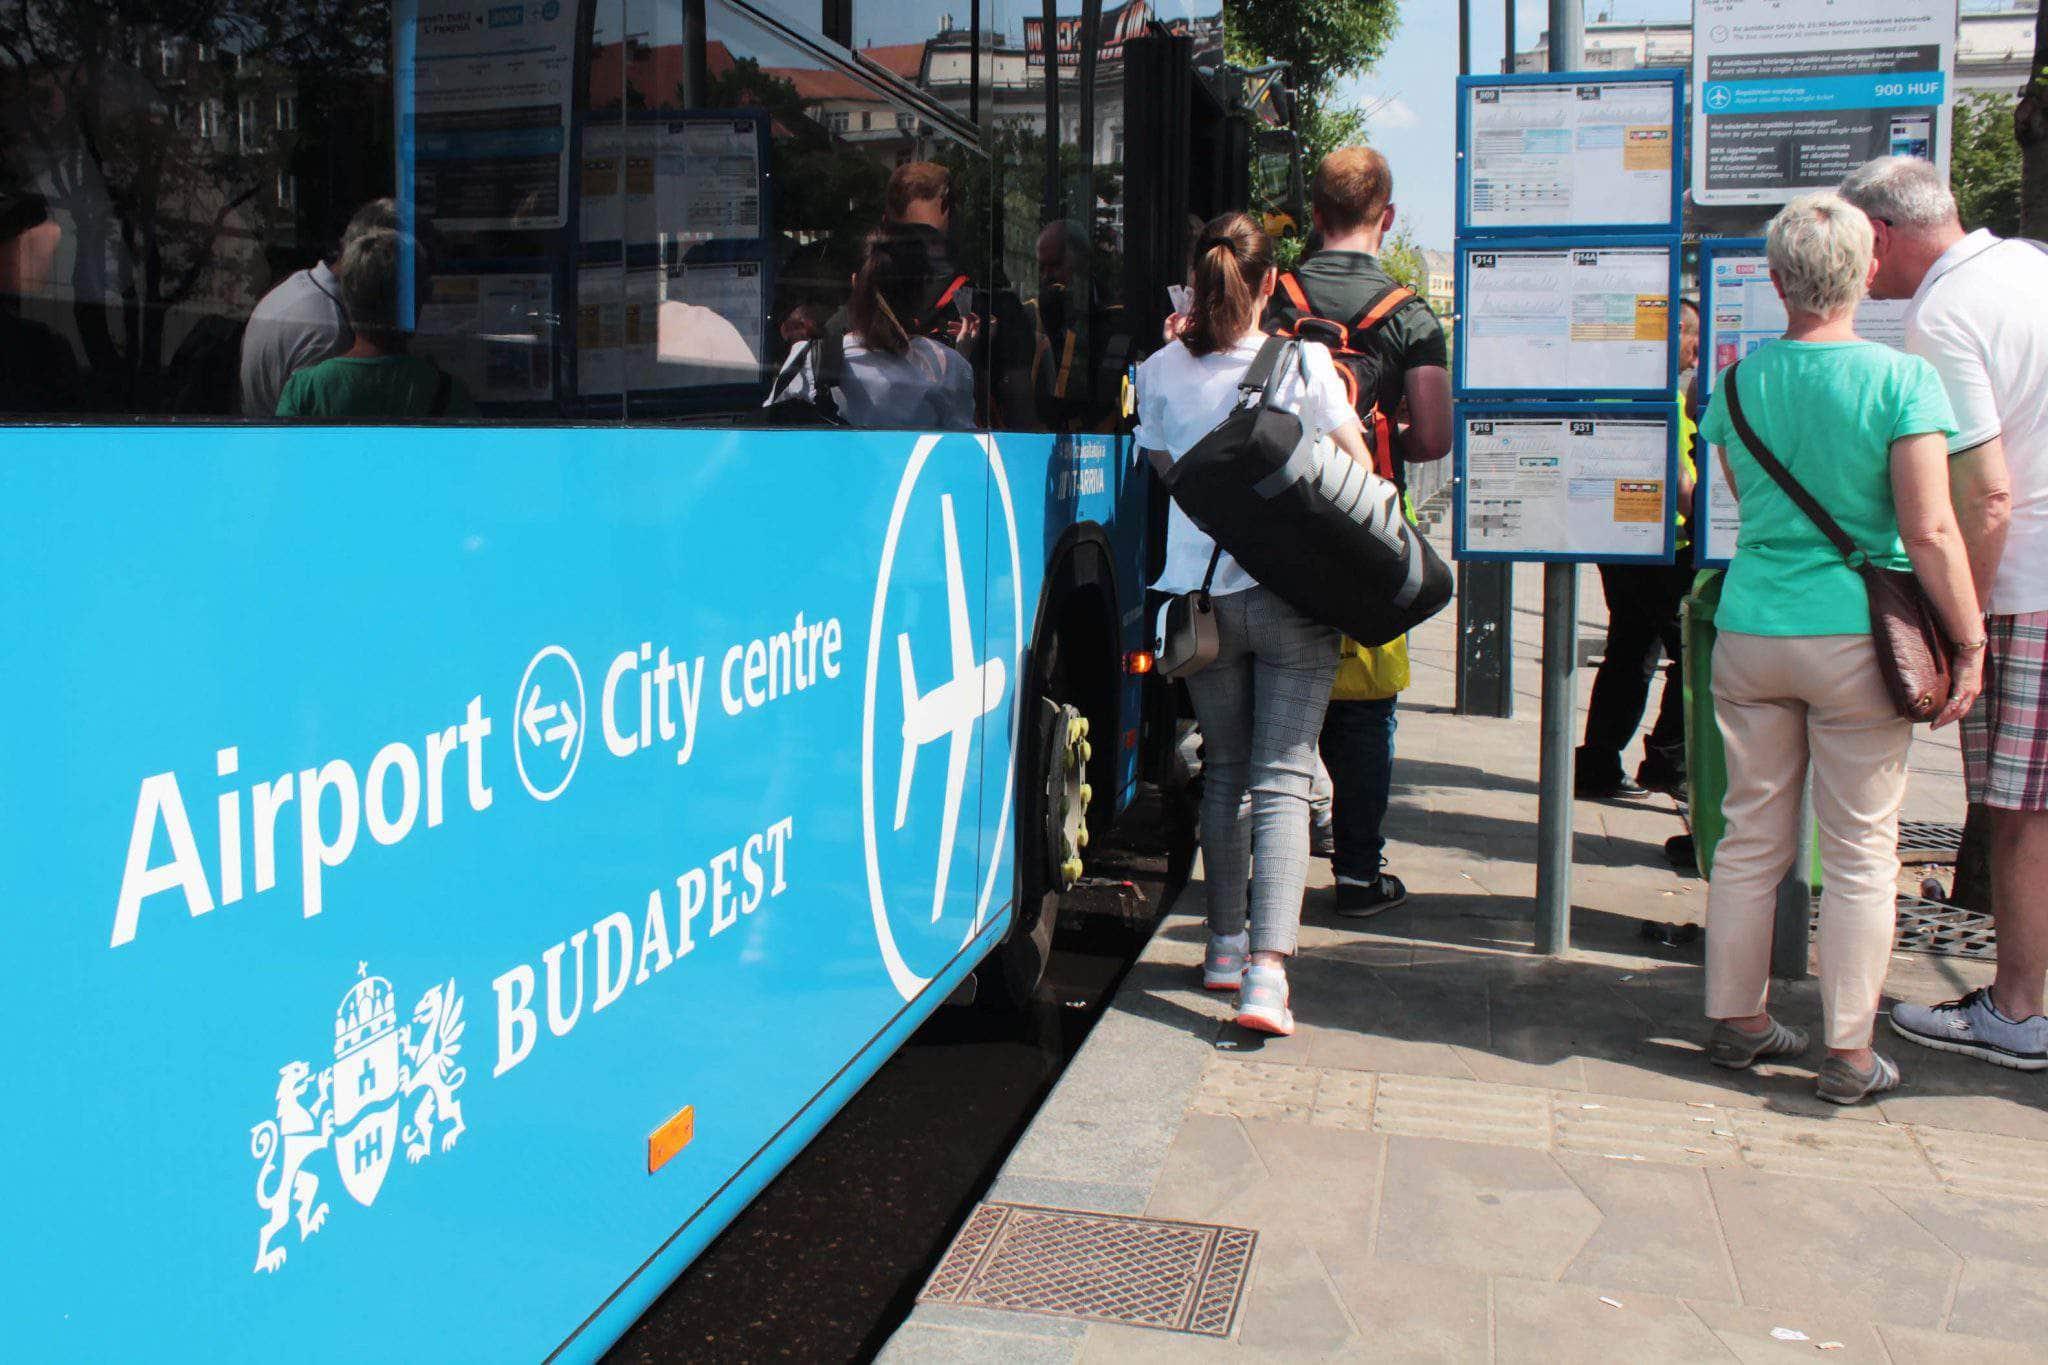 airport bus transfer budapest hungary bkk bkv